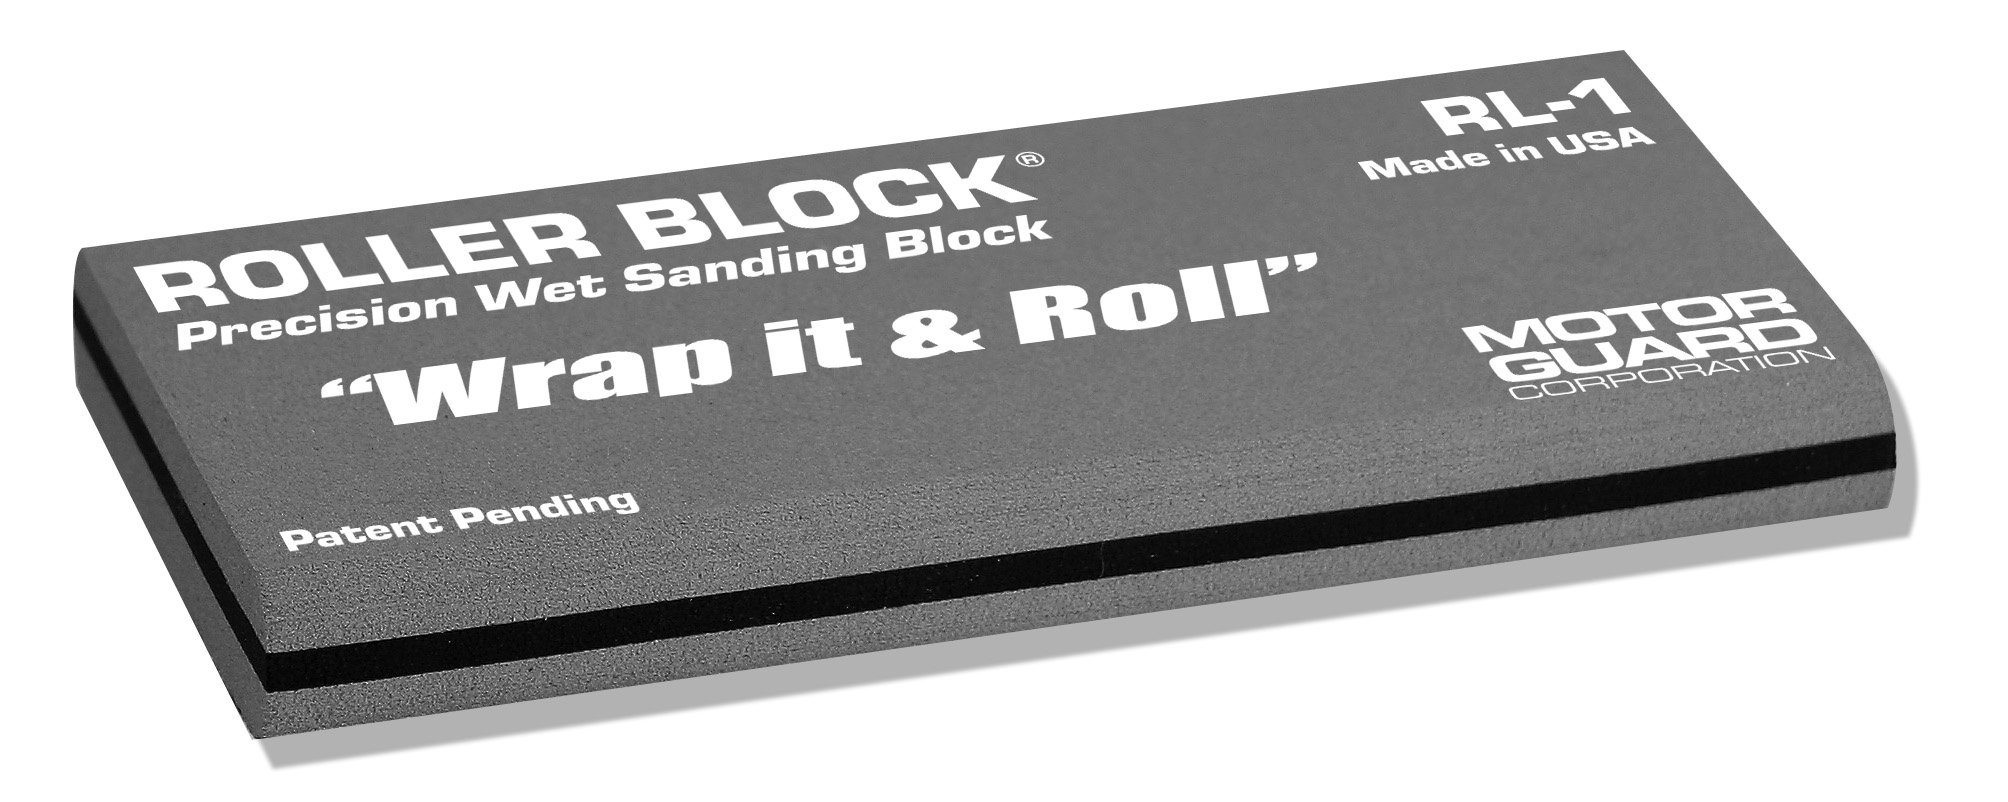 Motor Guard RL-1 Roller Block Sanding Block